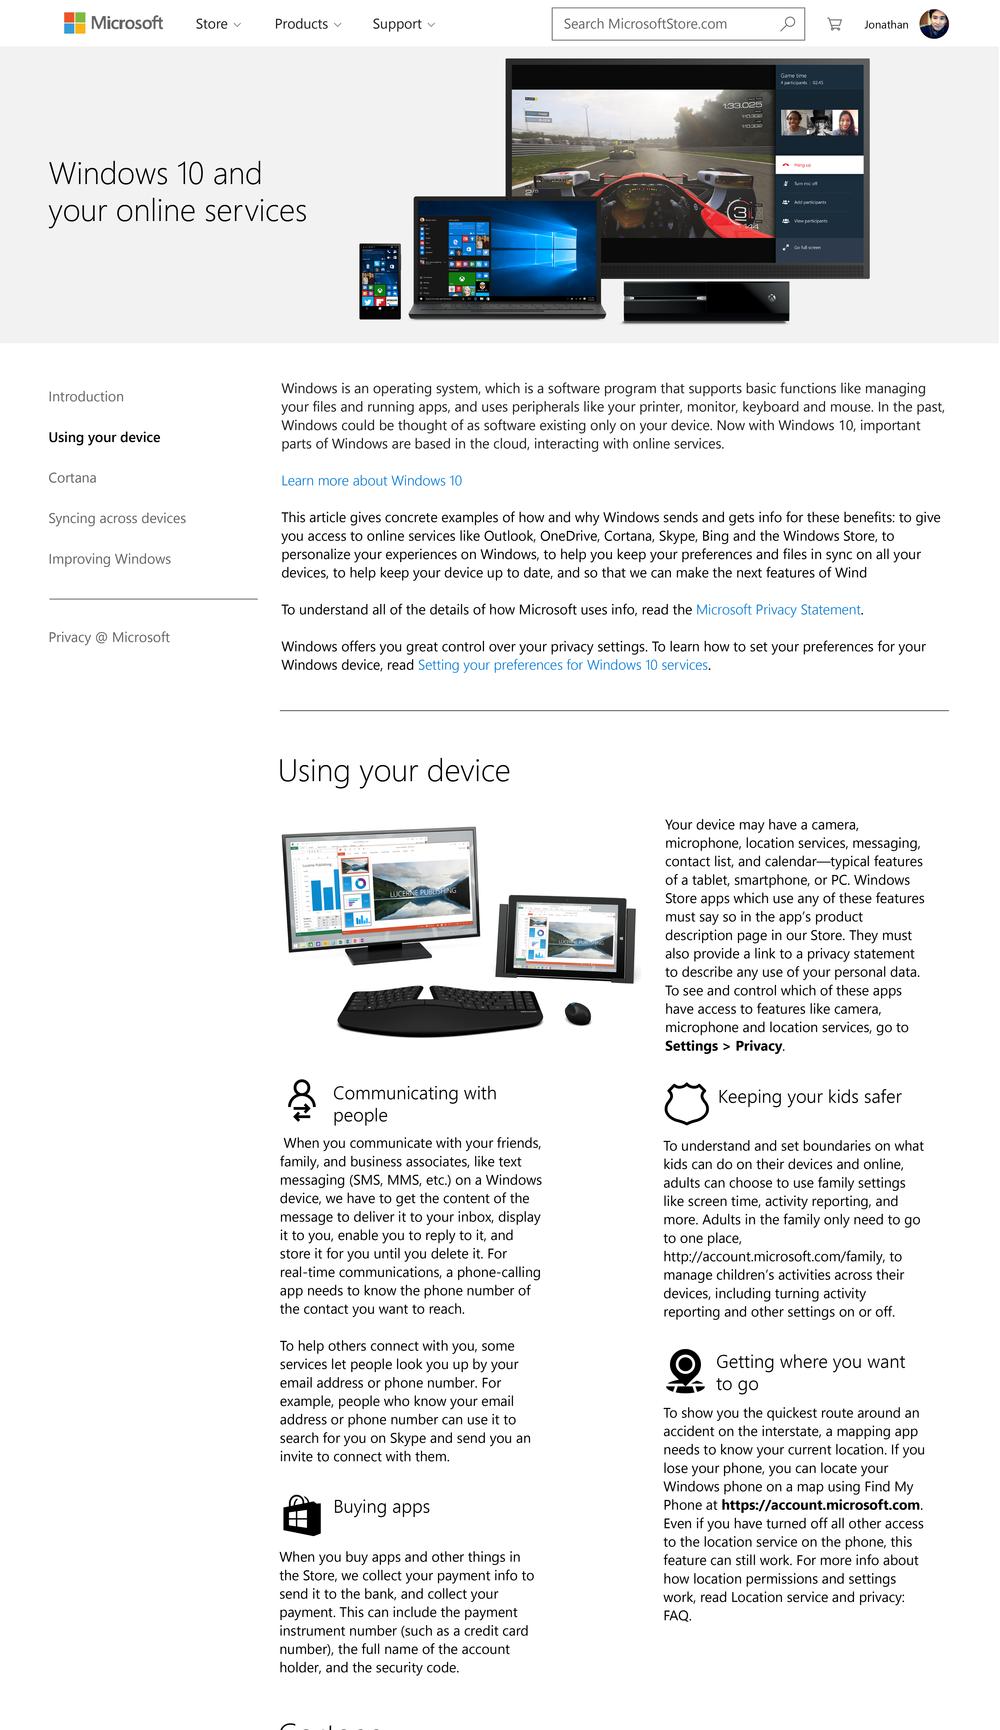 Windows 10 blog post